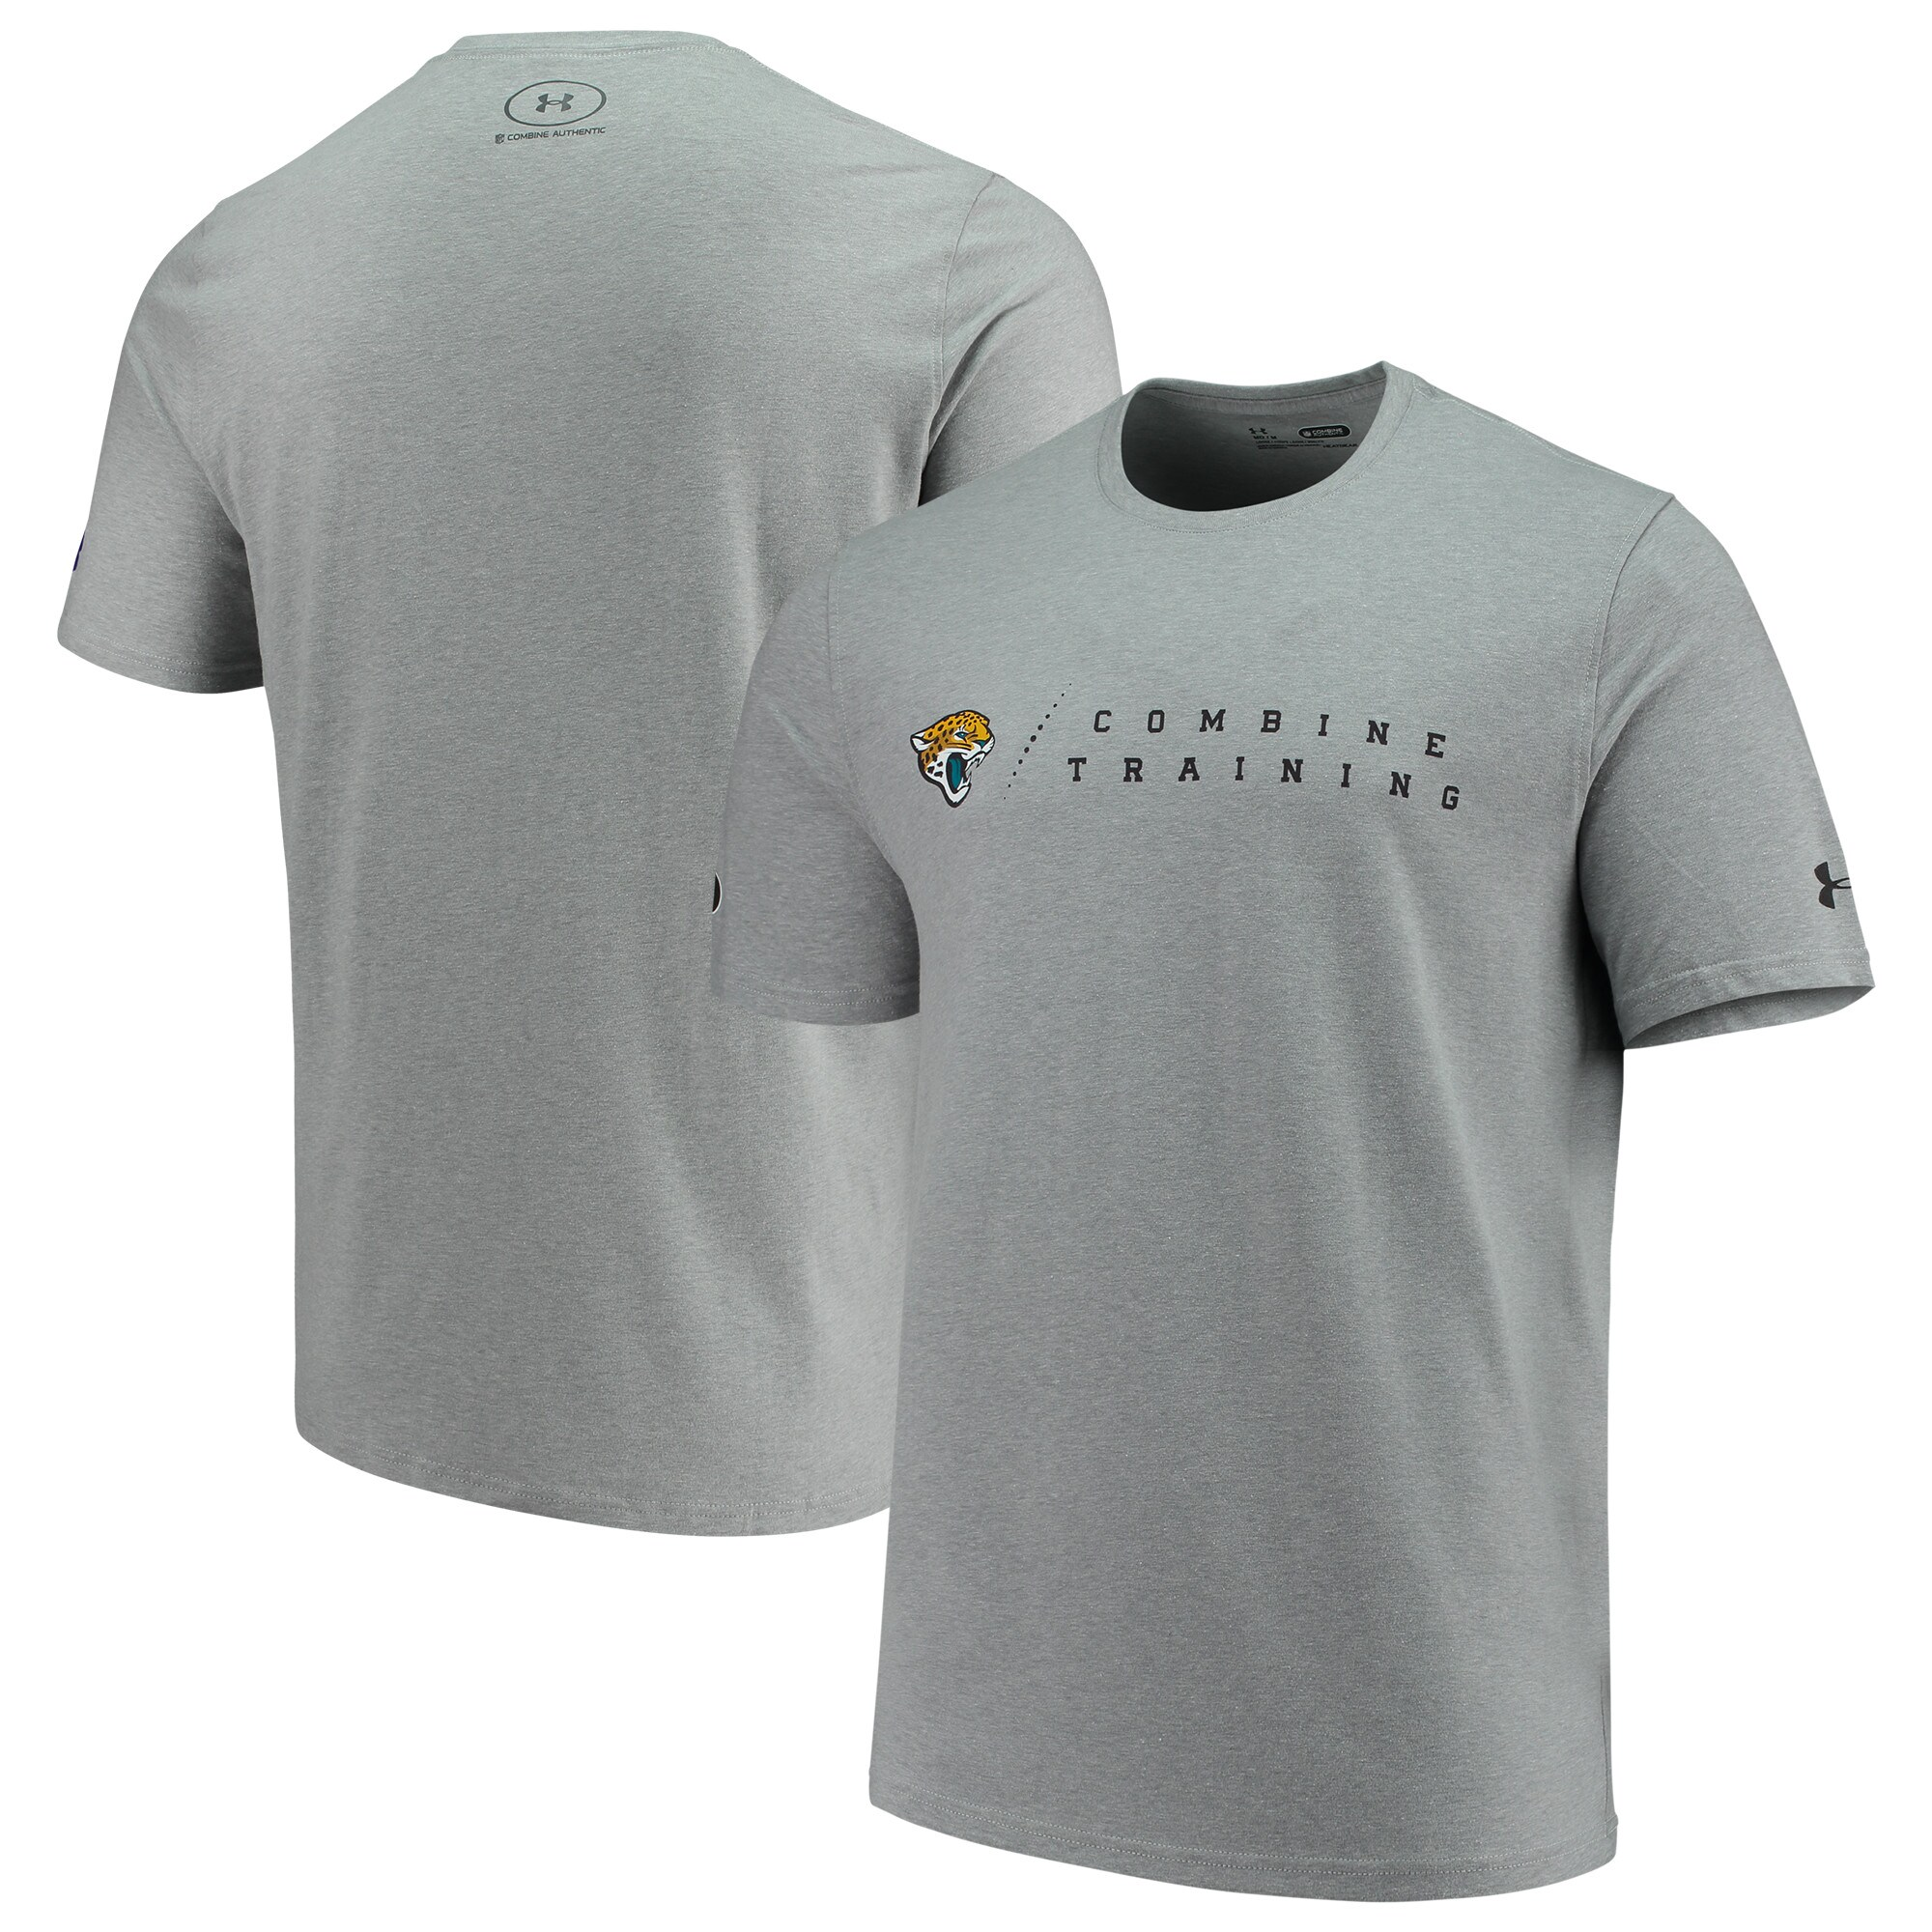 Jacksonville Jaguars Under Armour Combine Authentic Team Logo Training Tri-Blend Performance T-Shirt - Heathered Gray